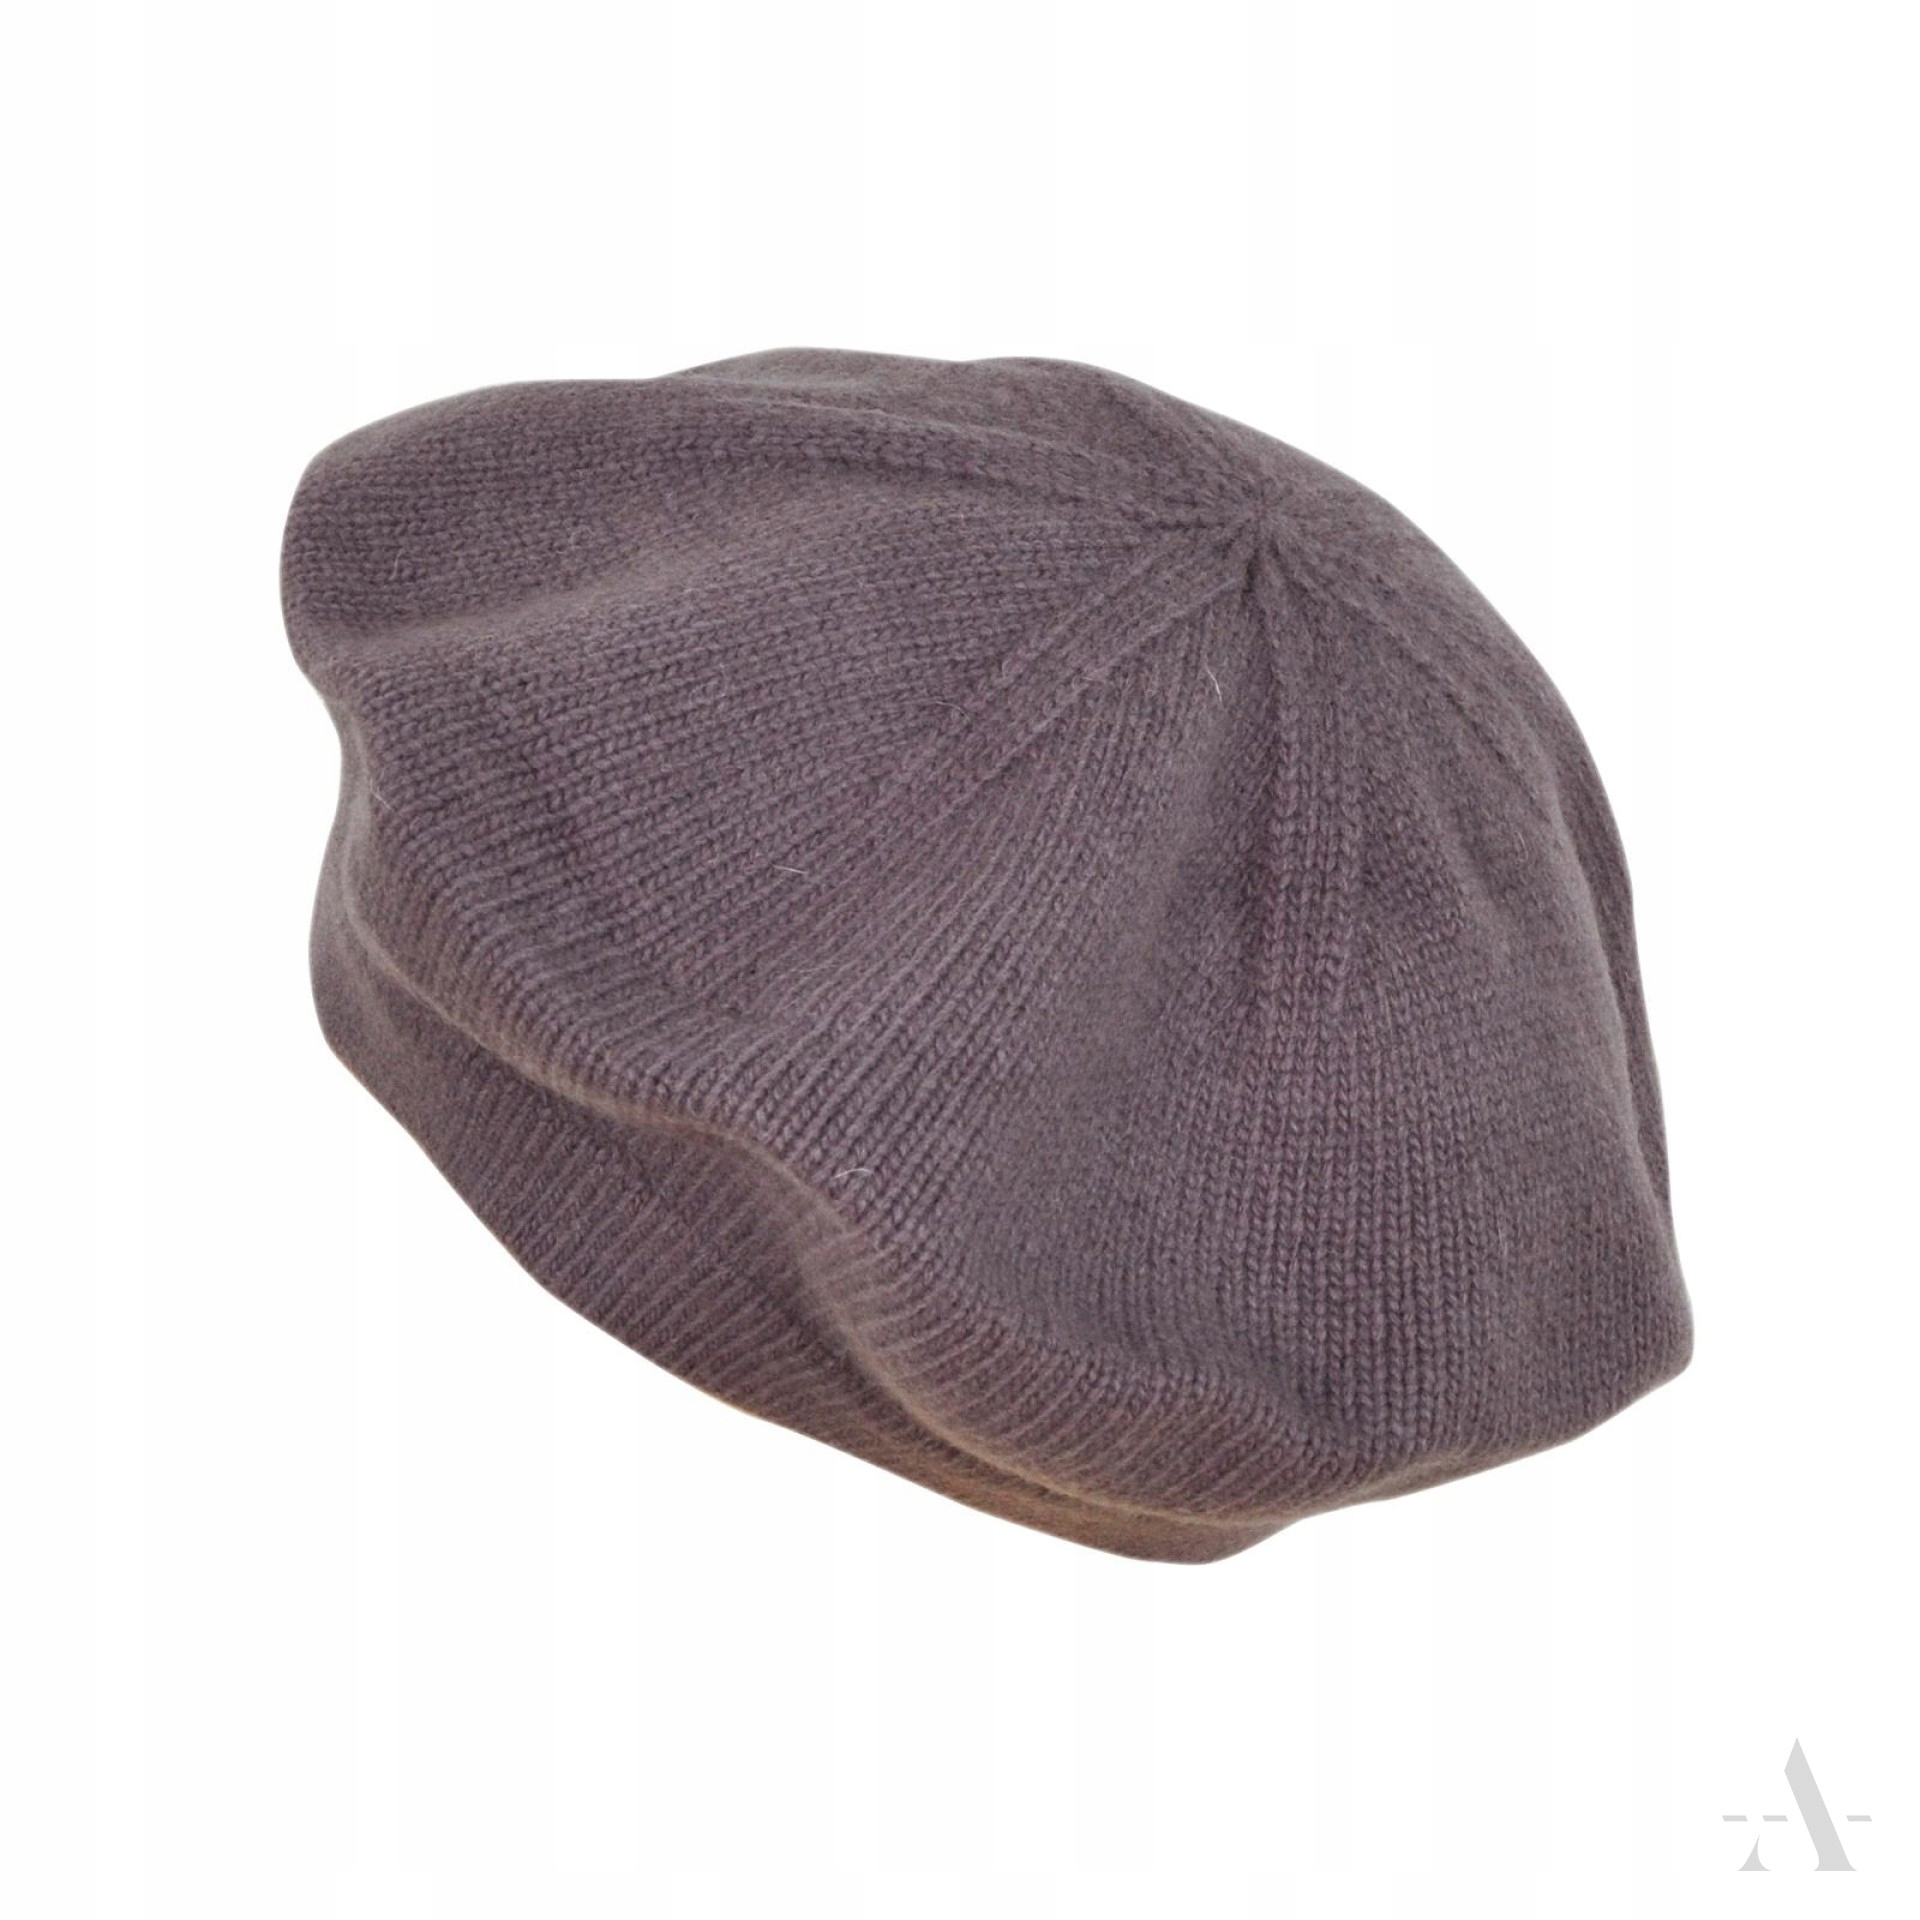 Dámsky retro baret Premium WOOL Elegantný LUX!